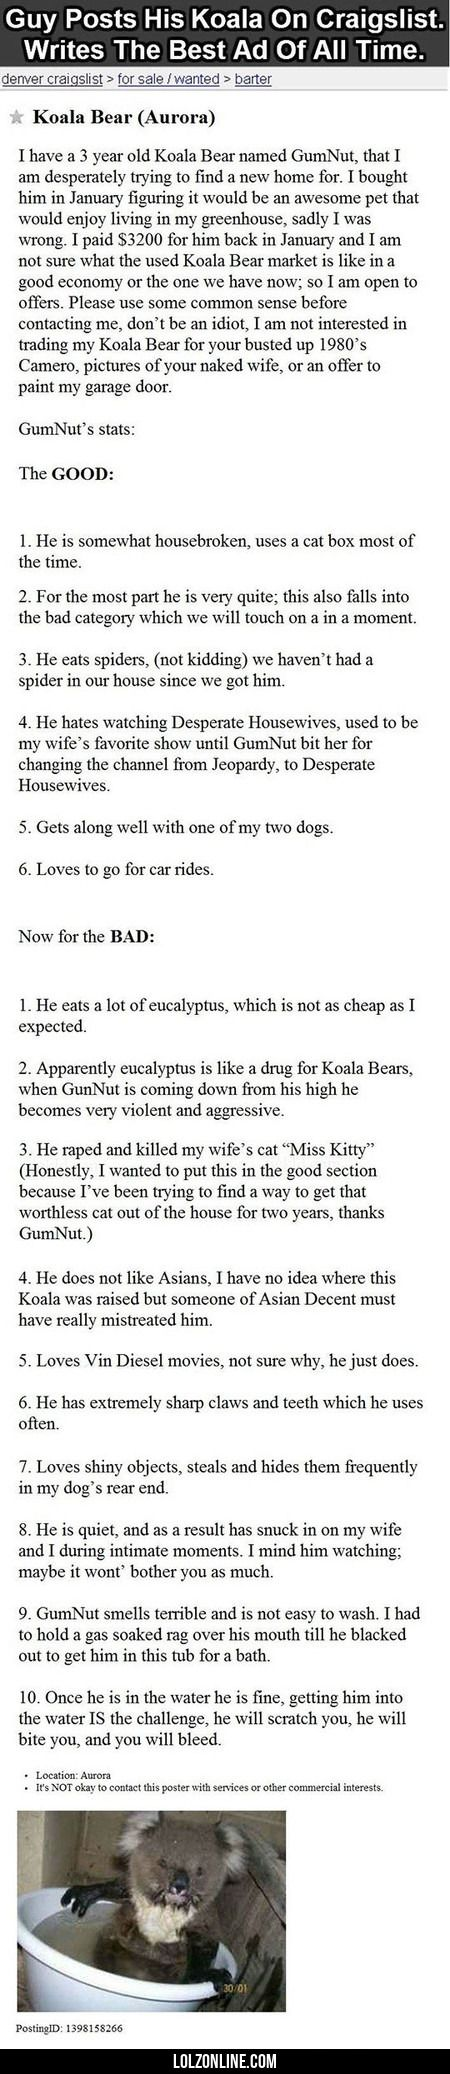 Guy Posts His Koala On Craigslist#funny #lol #lolzonline